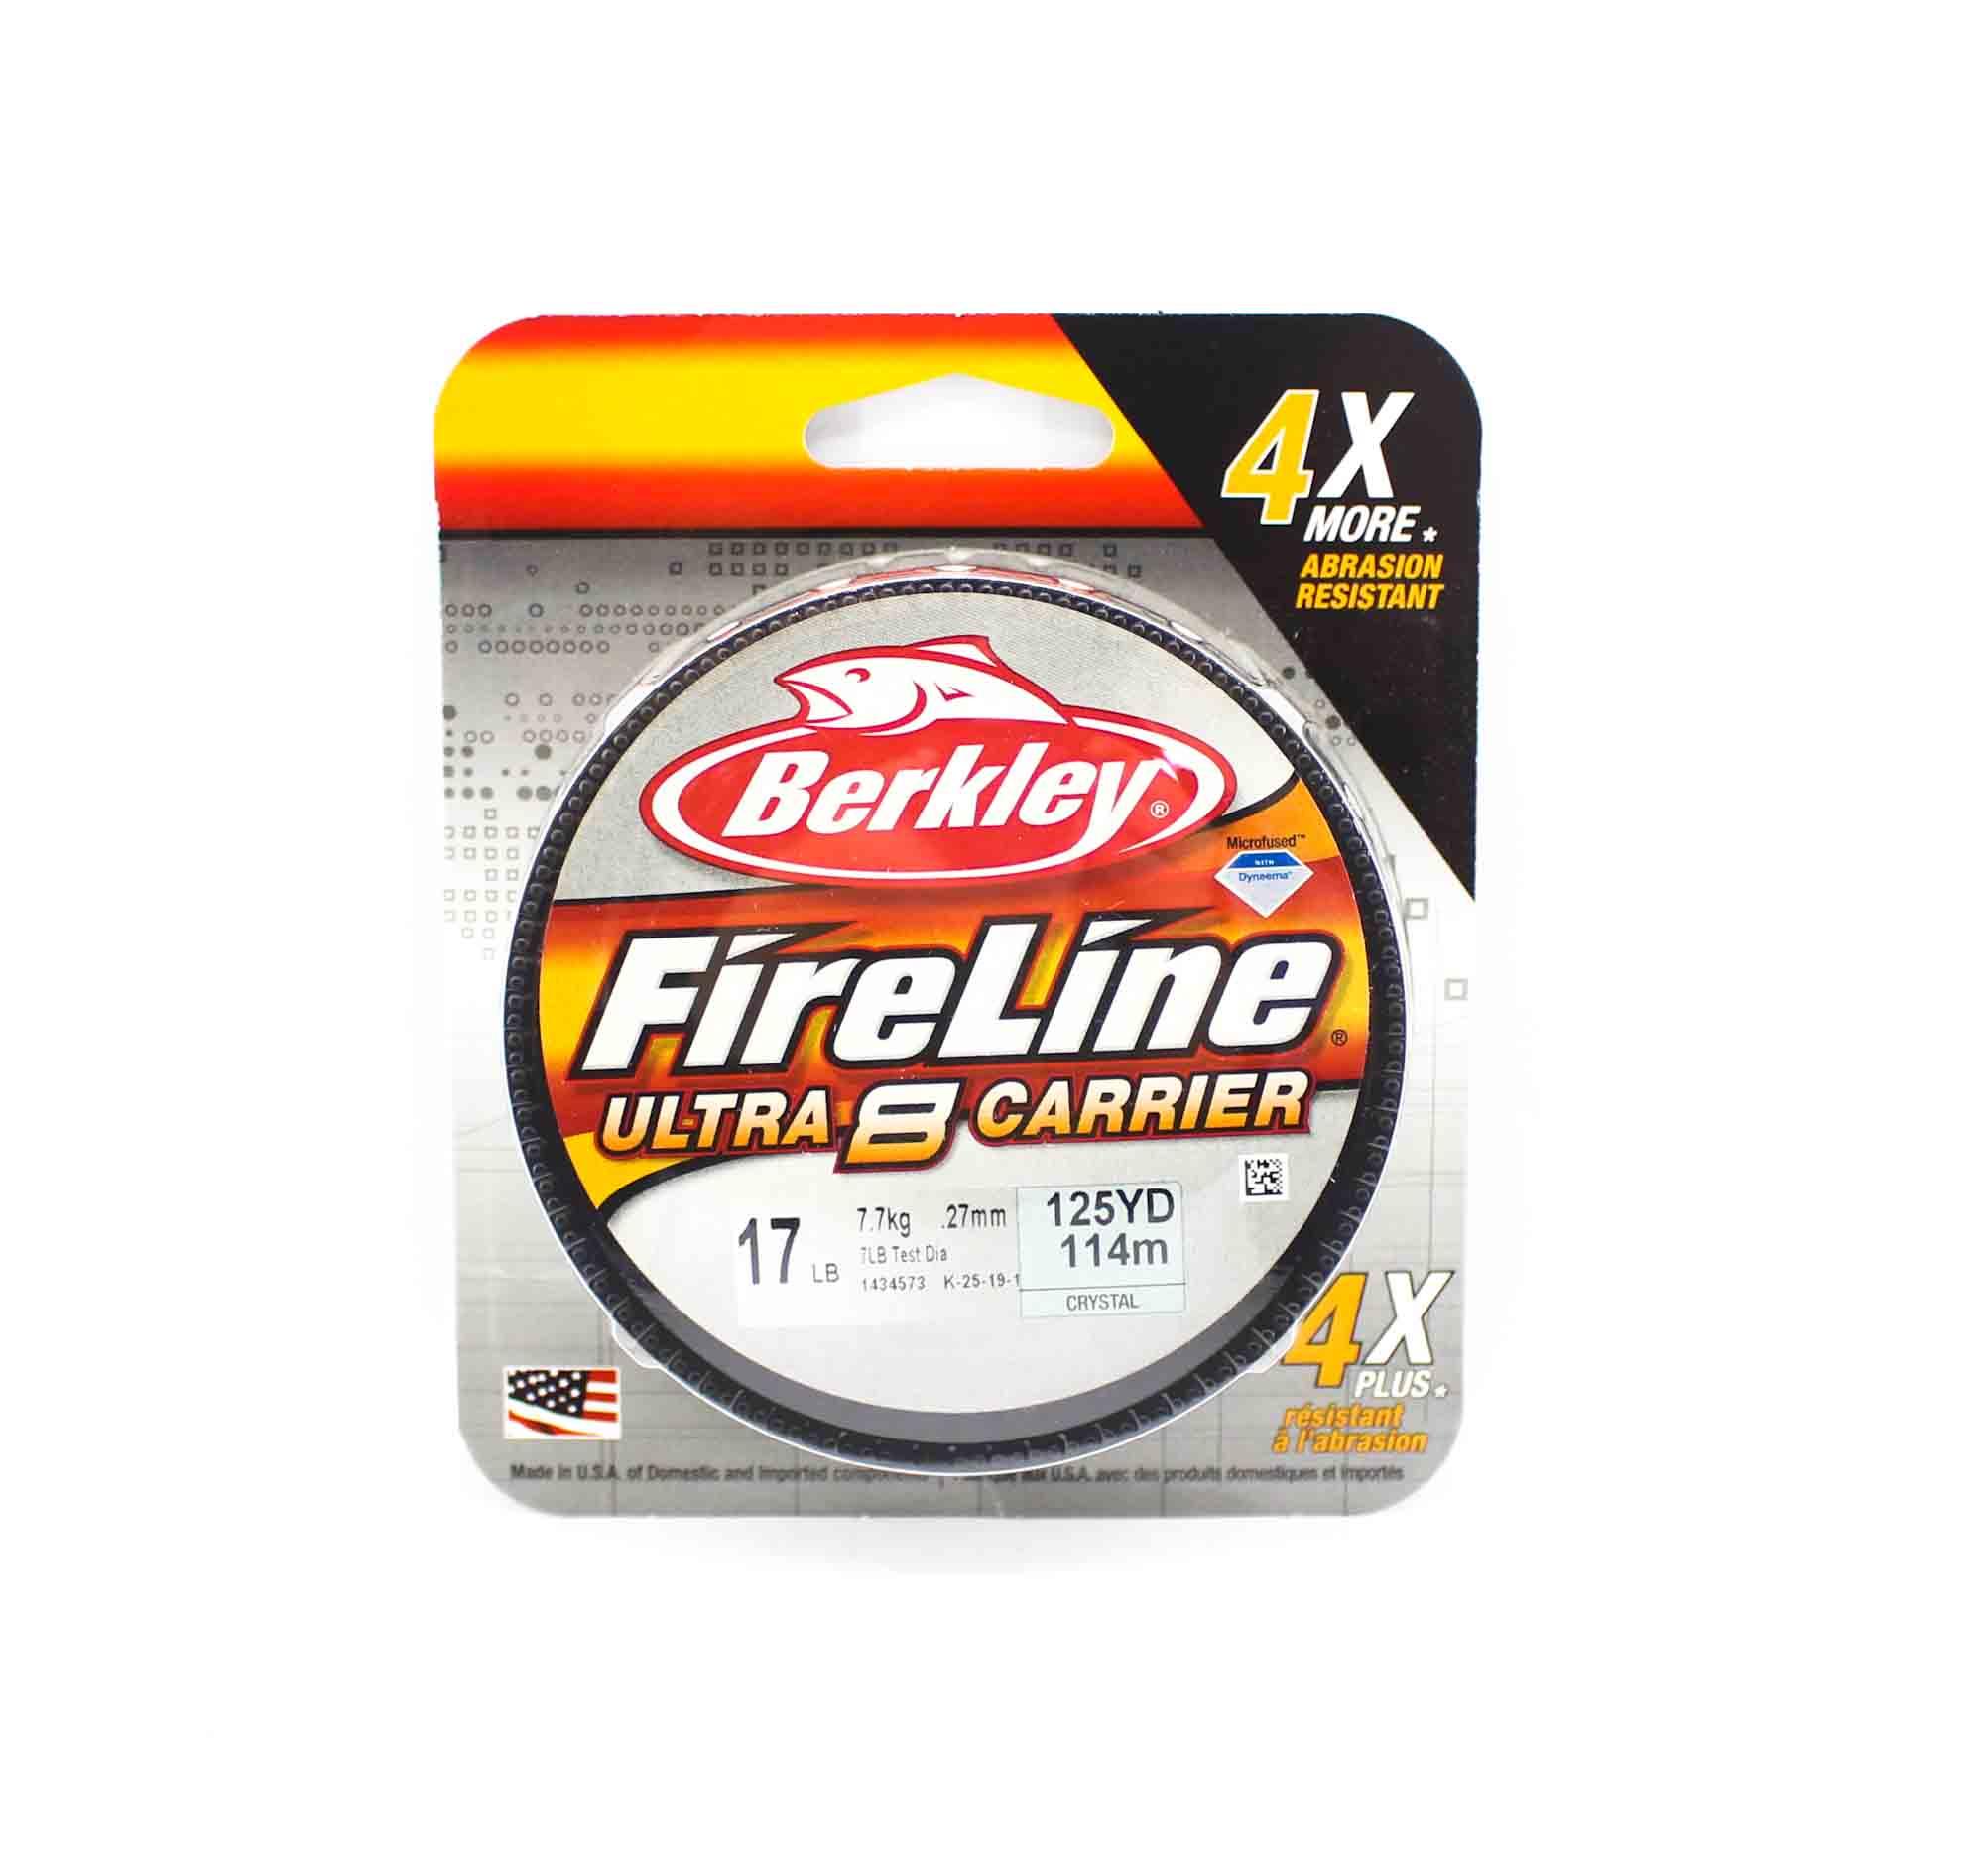 Berkley Fireline Ultra 8 Carrier 125yds 17lb White (4496)